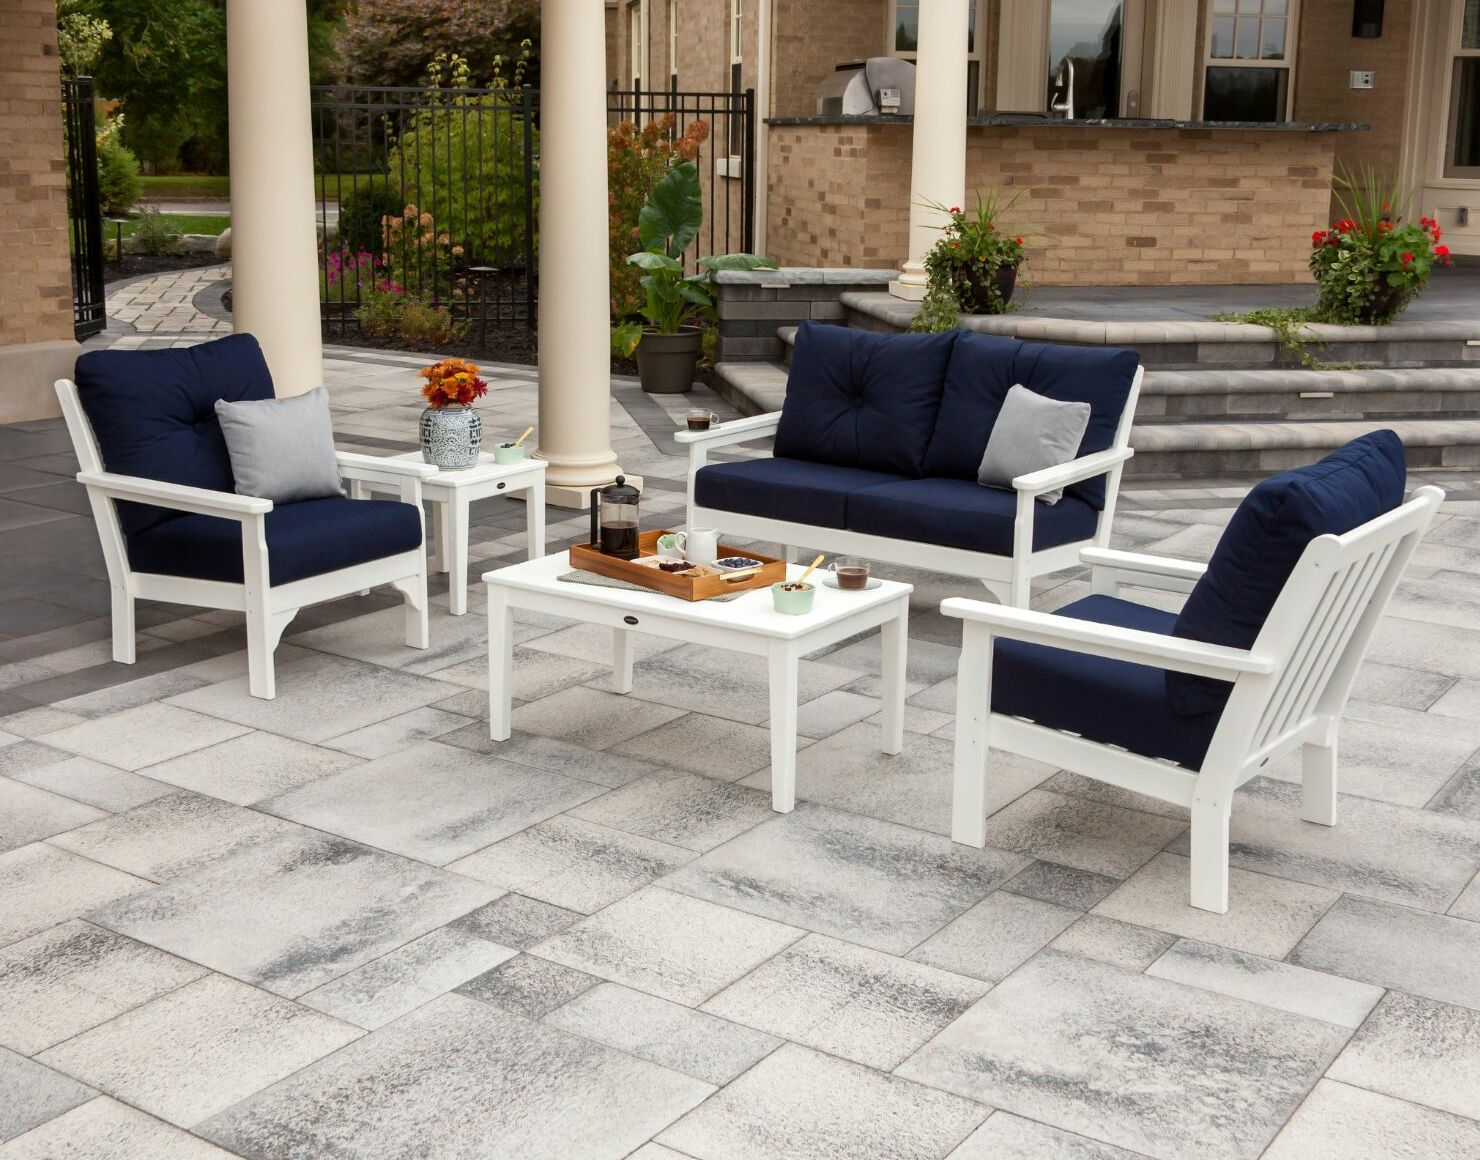 Vineyard 5 Piece Sunbrella Sofa Set with Cushions Frame Color: Slate Gray, Fabric: Natural